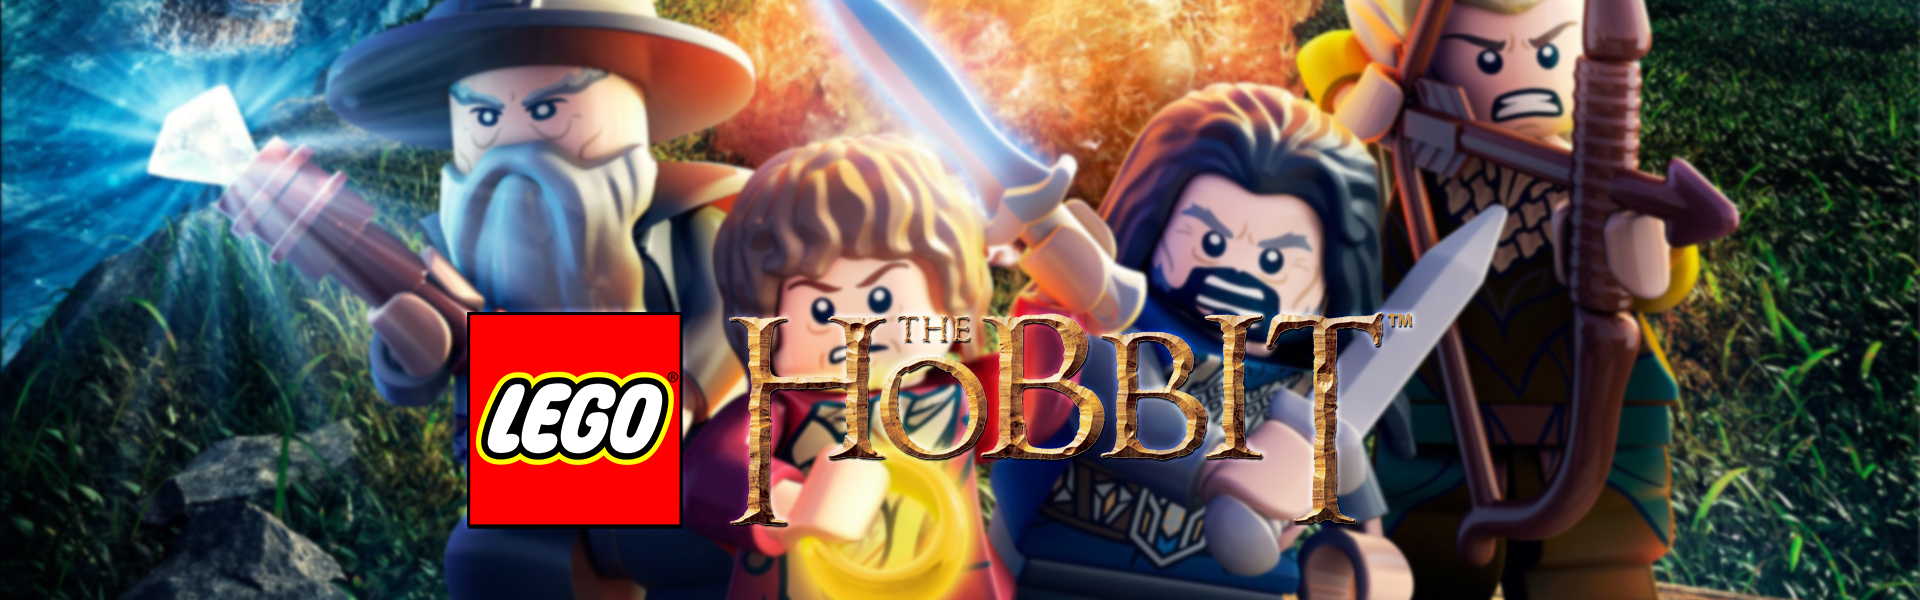 http://robwestwood.com/wp-content/uploads/2013/01/Hobbit-Banner.jpg